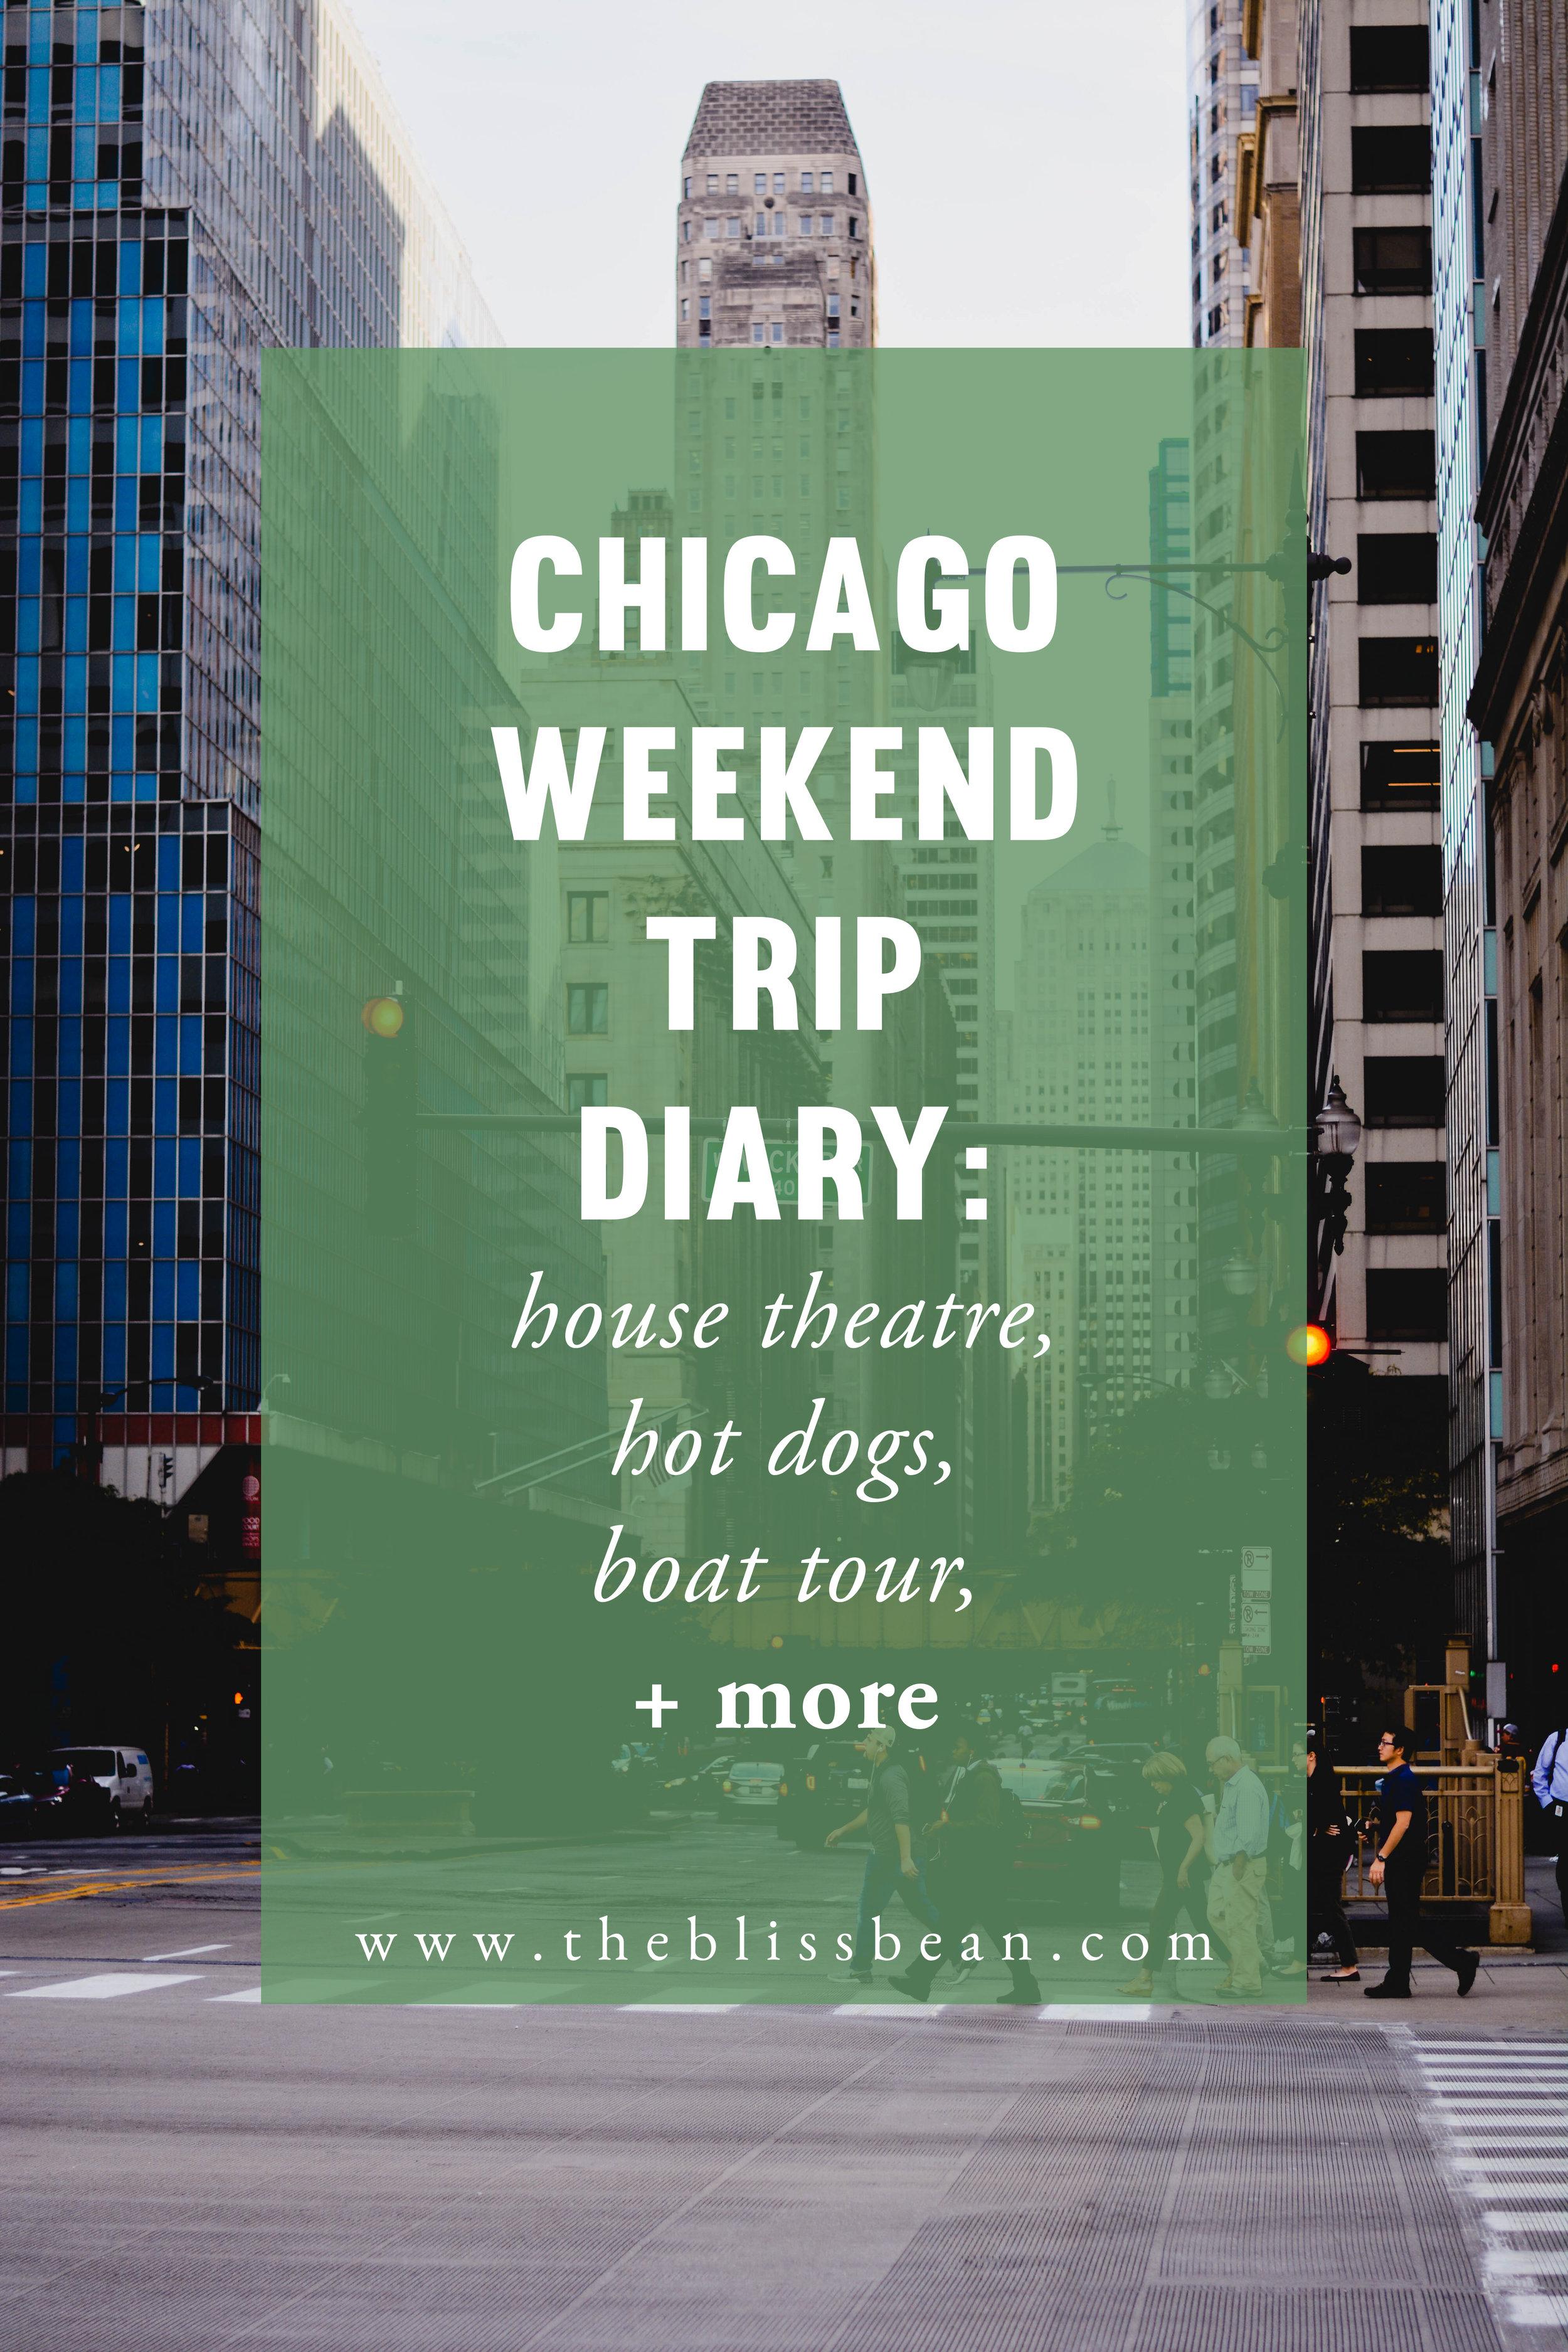 Chicago Trip Cover Photo.jpg